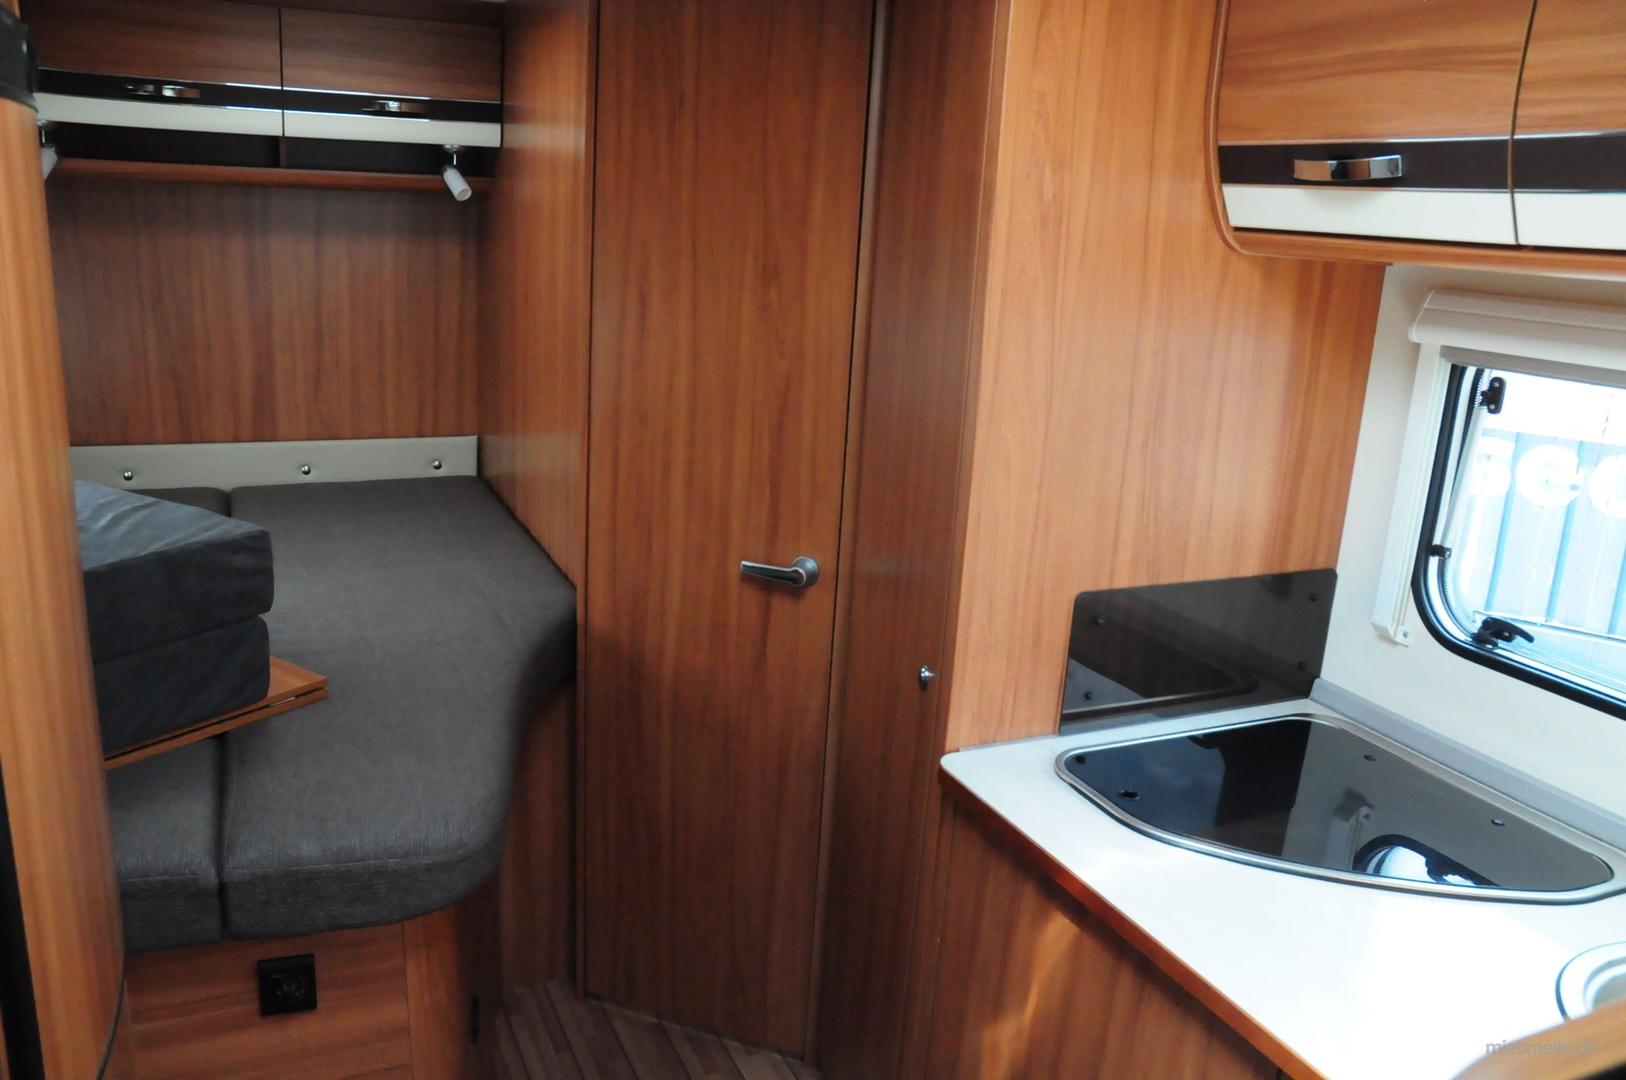 wohnmobil zu vermieten ab 75 tag reisefertig. Black Bedroom Furniture Sets. Home Design Ideas